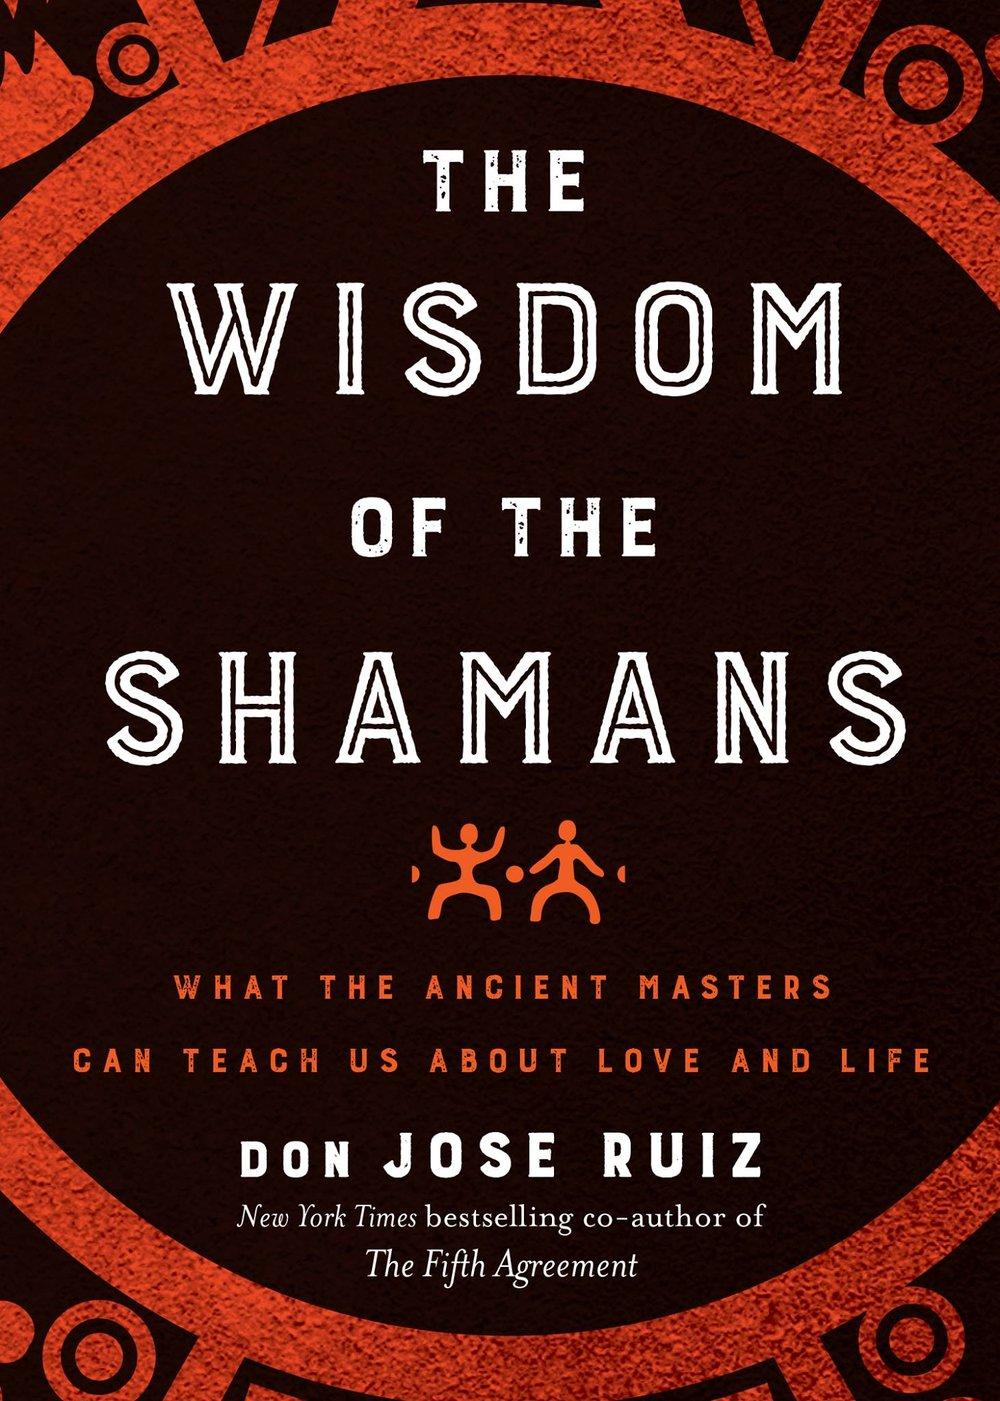 dJR Book Wisdom of the Shamans.jpg